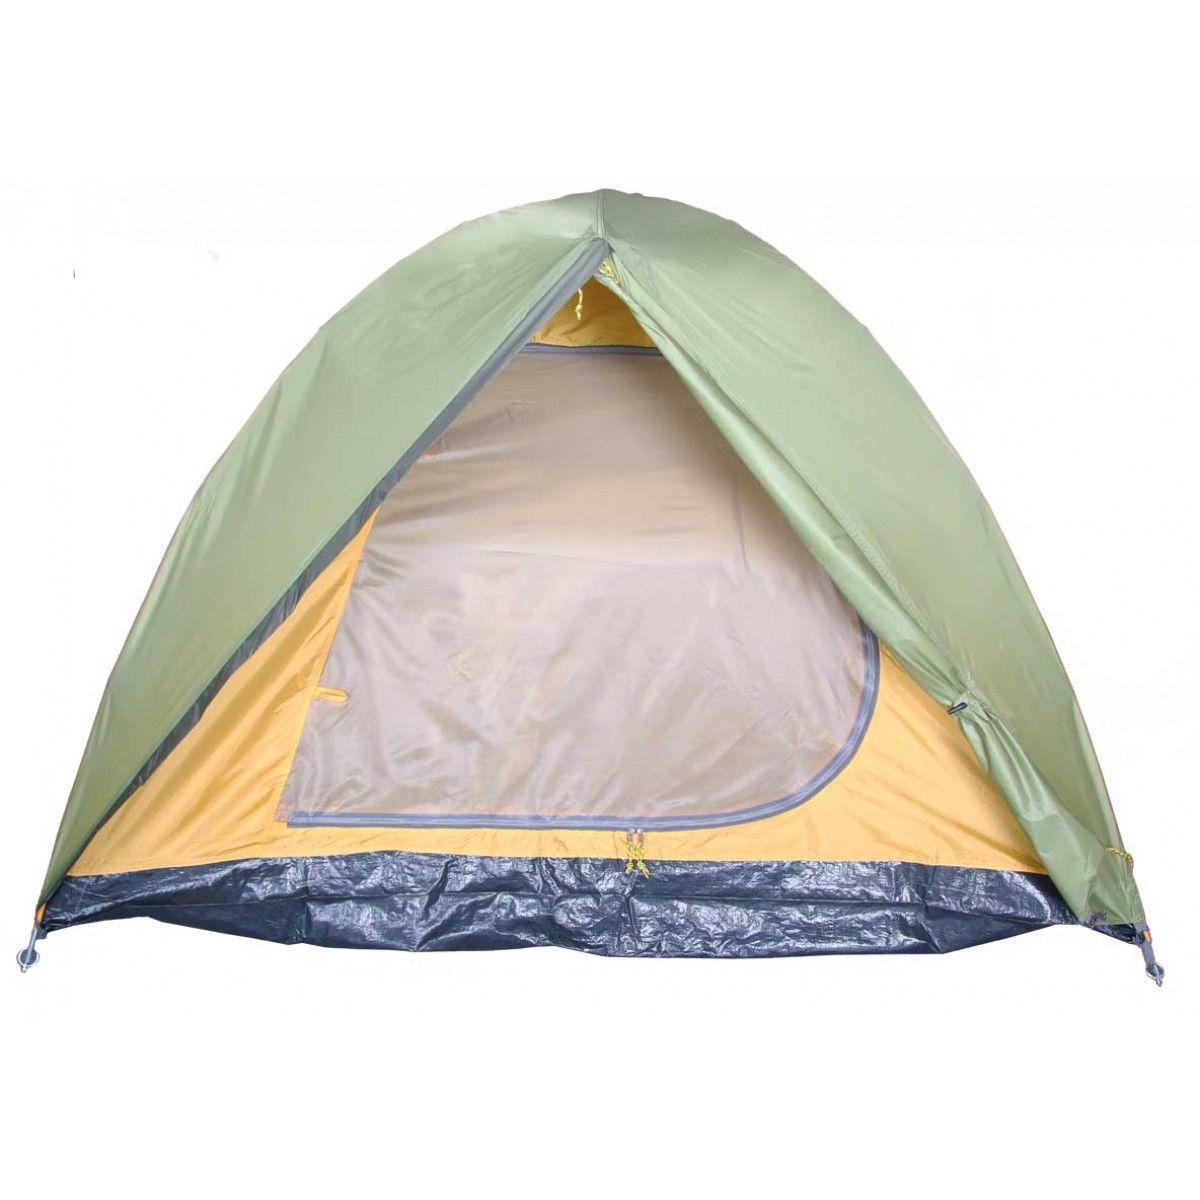 Палатка BREEZE-3 Helios зеленый HS-2370-3 - фото 2